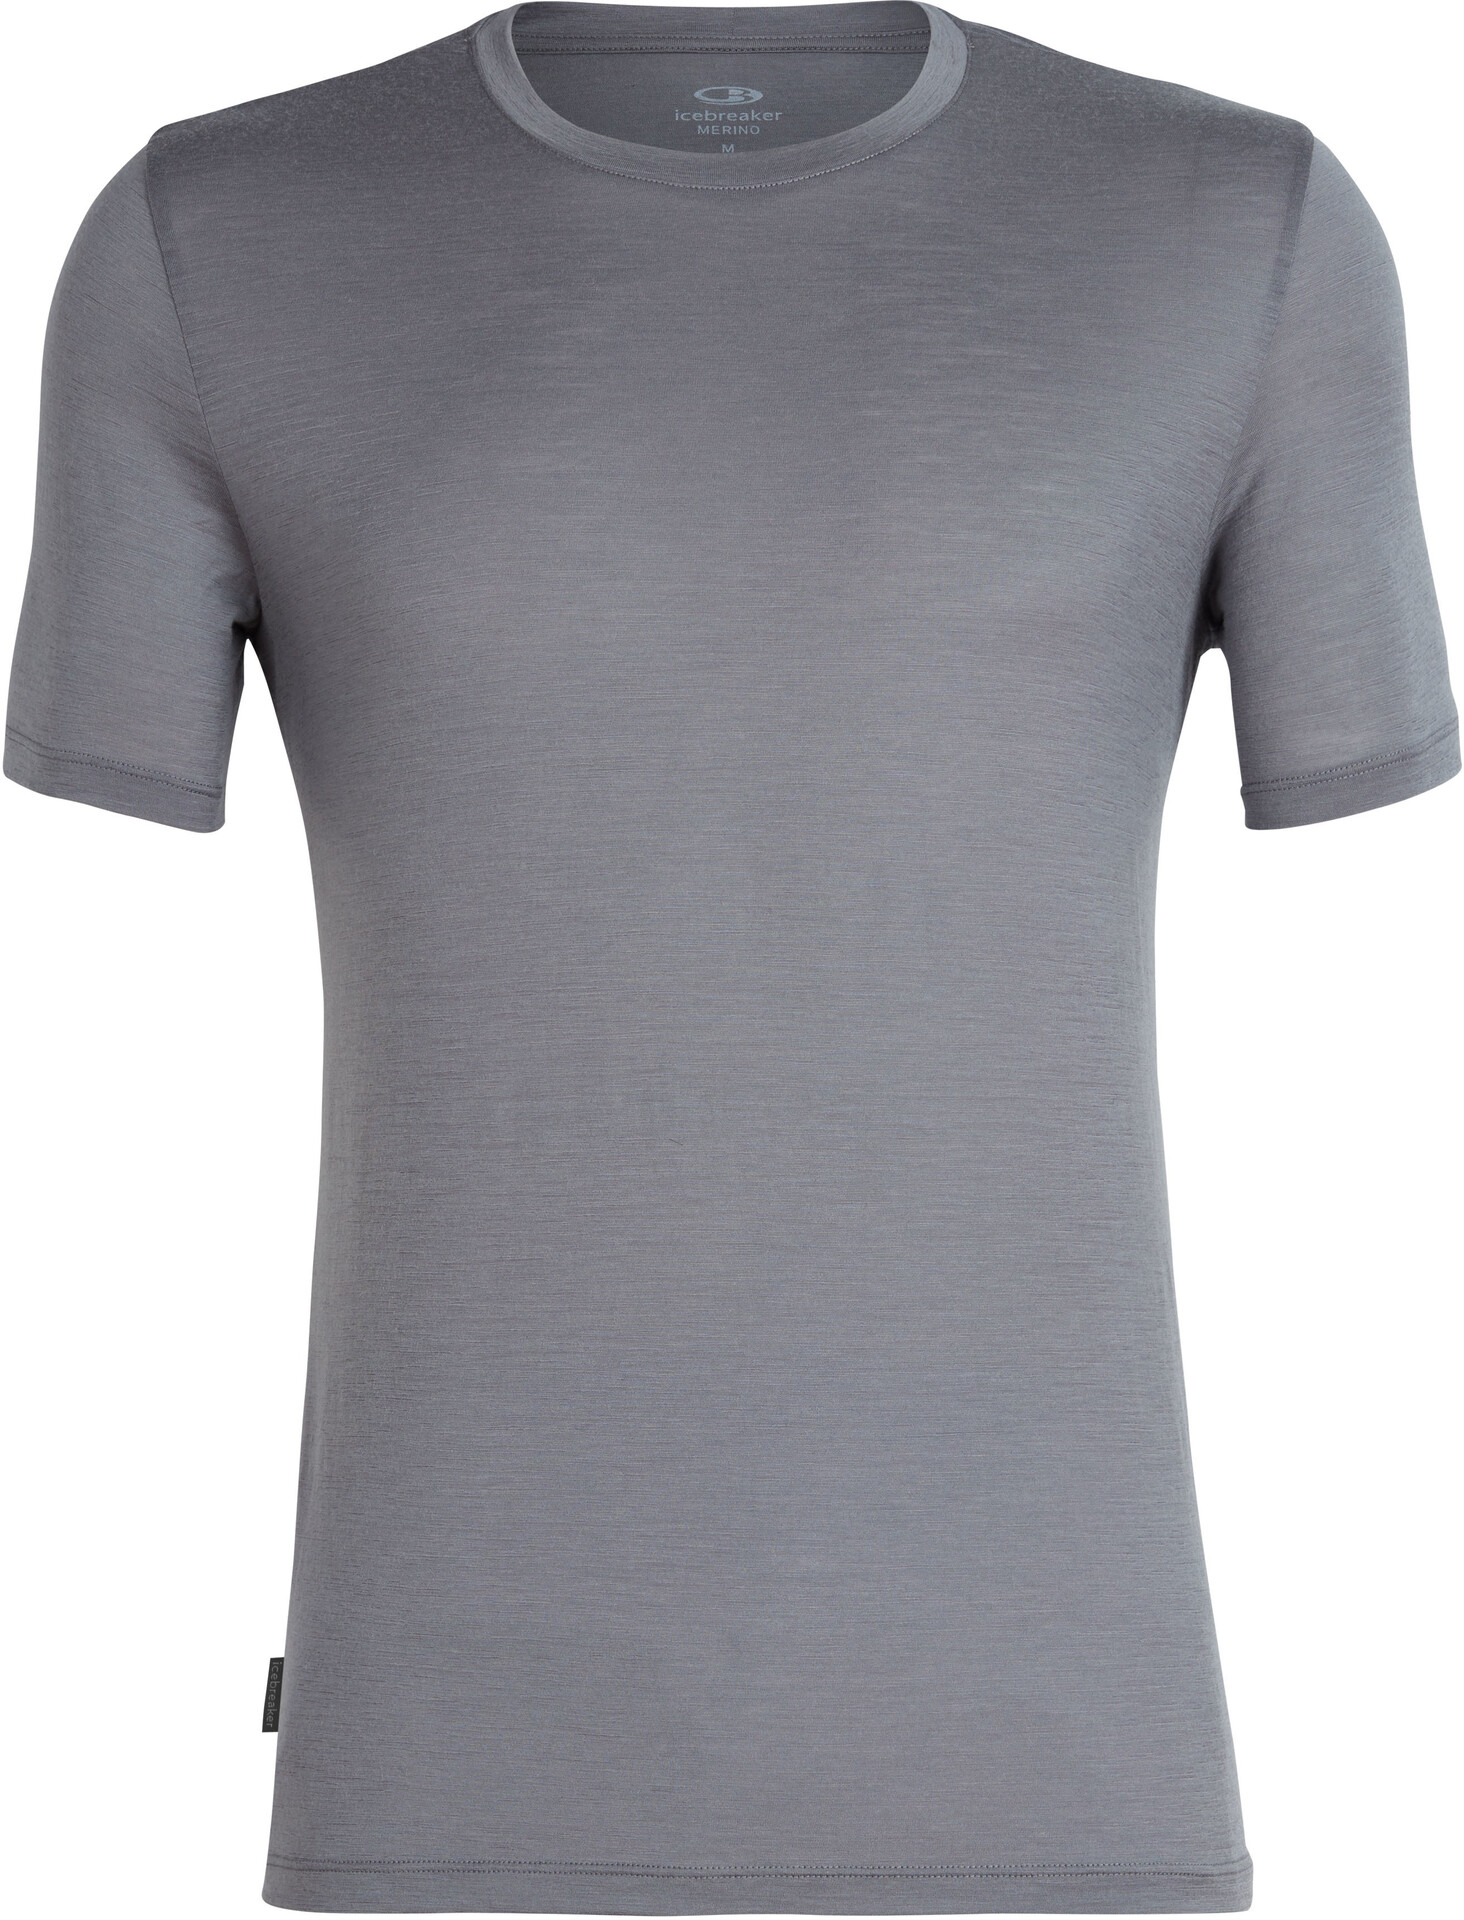 Black 2019 T-Shirt Manches Courtes Icebreaker Tech Lite Everest Crest SS Crewe Top Men